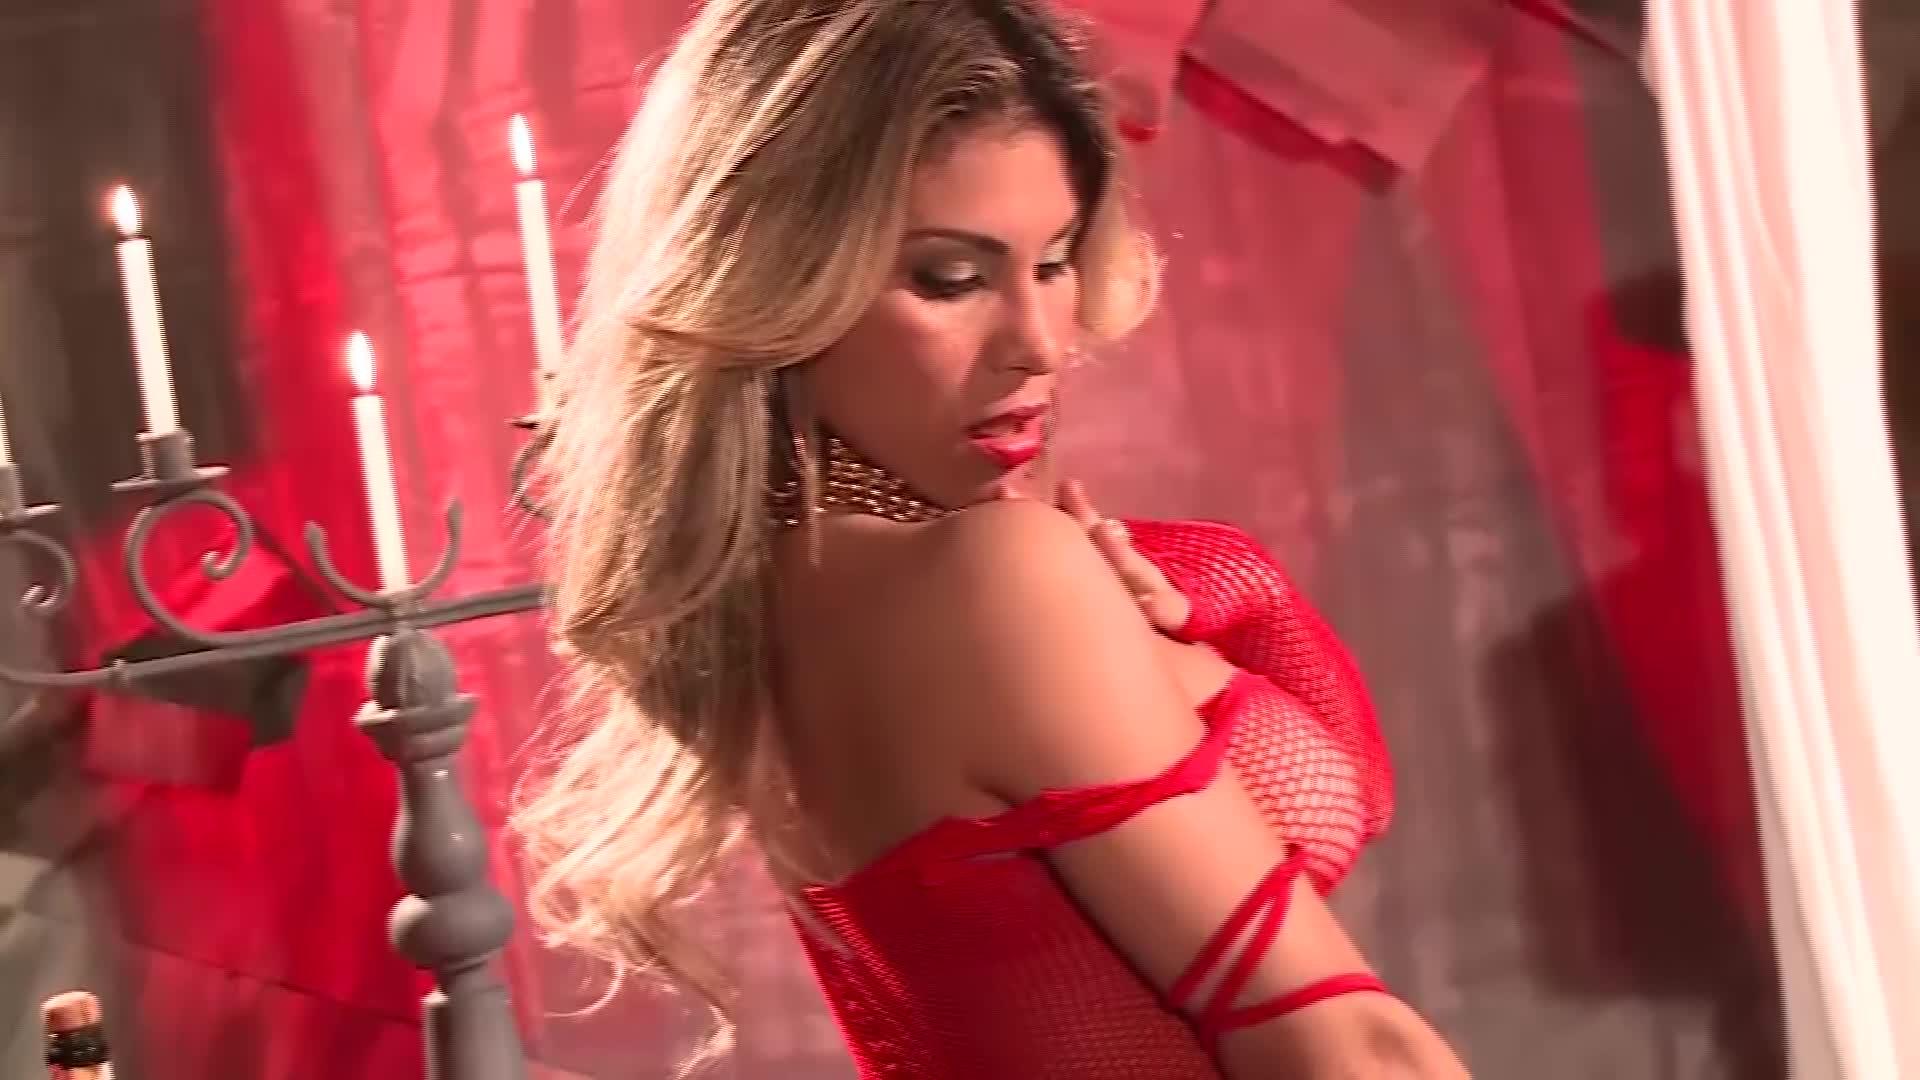 Brazilian Woman - Cindy Love